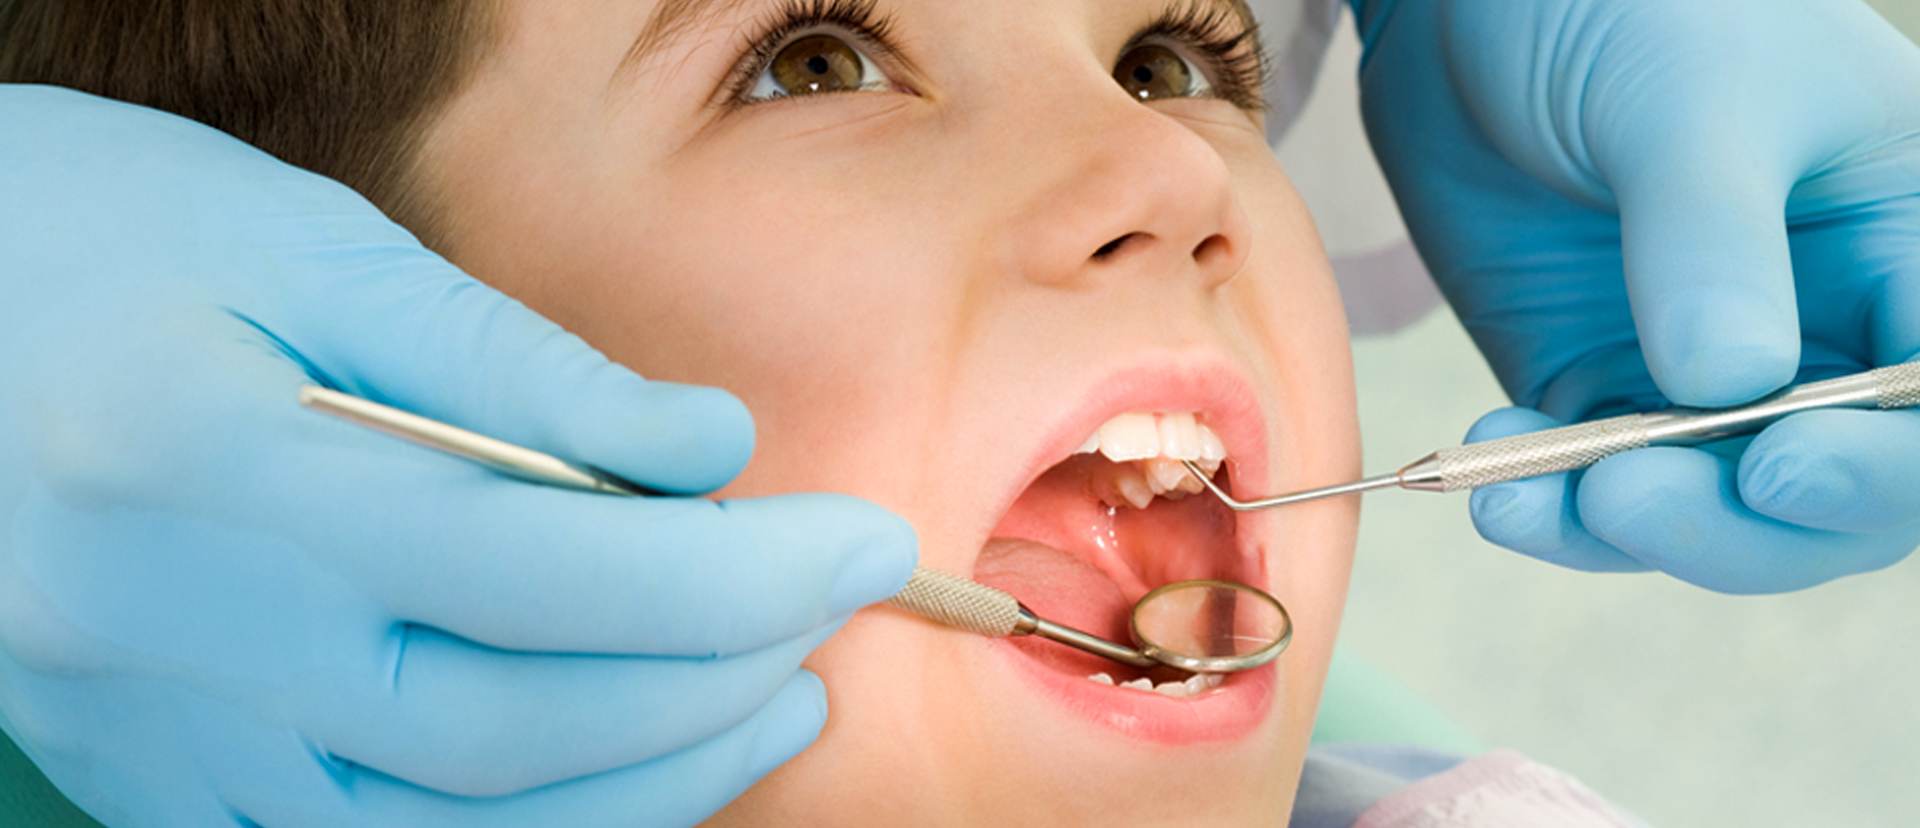 Childrens Dentist Hillarys